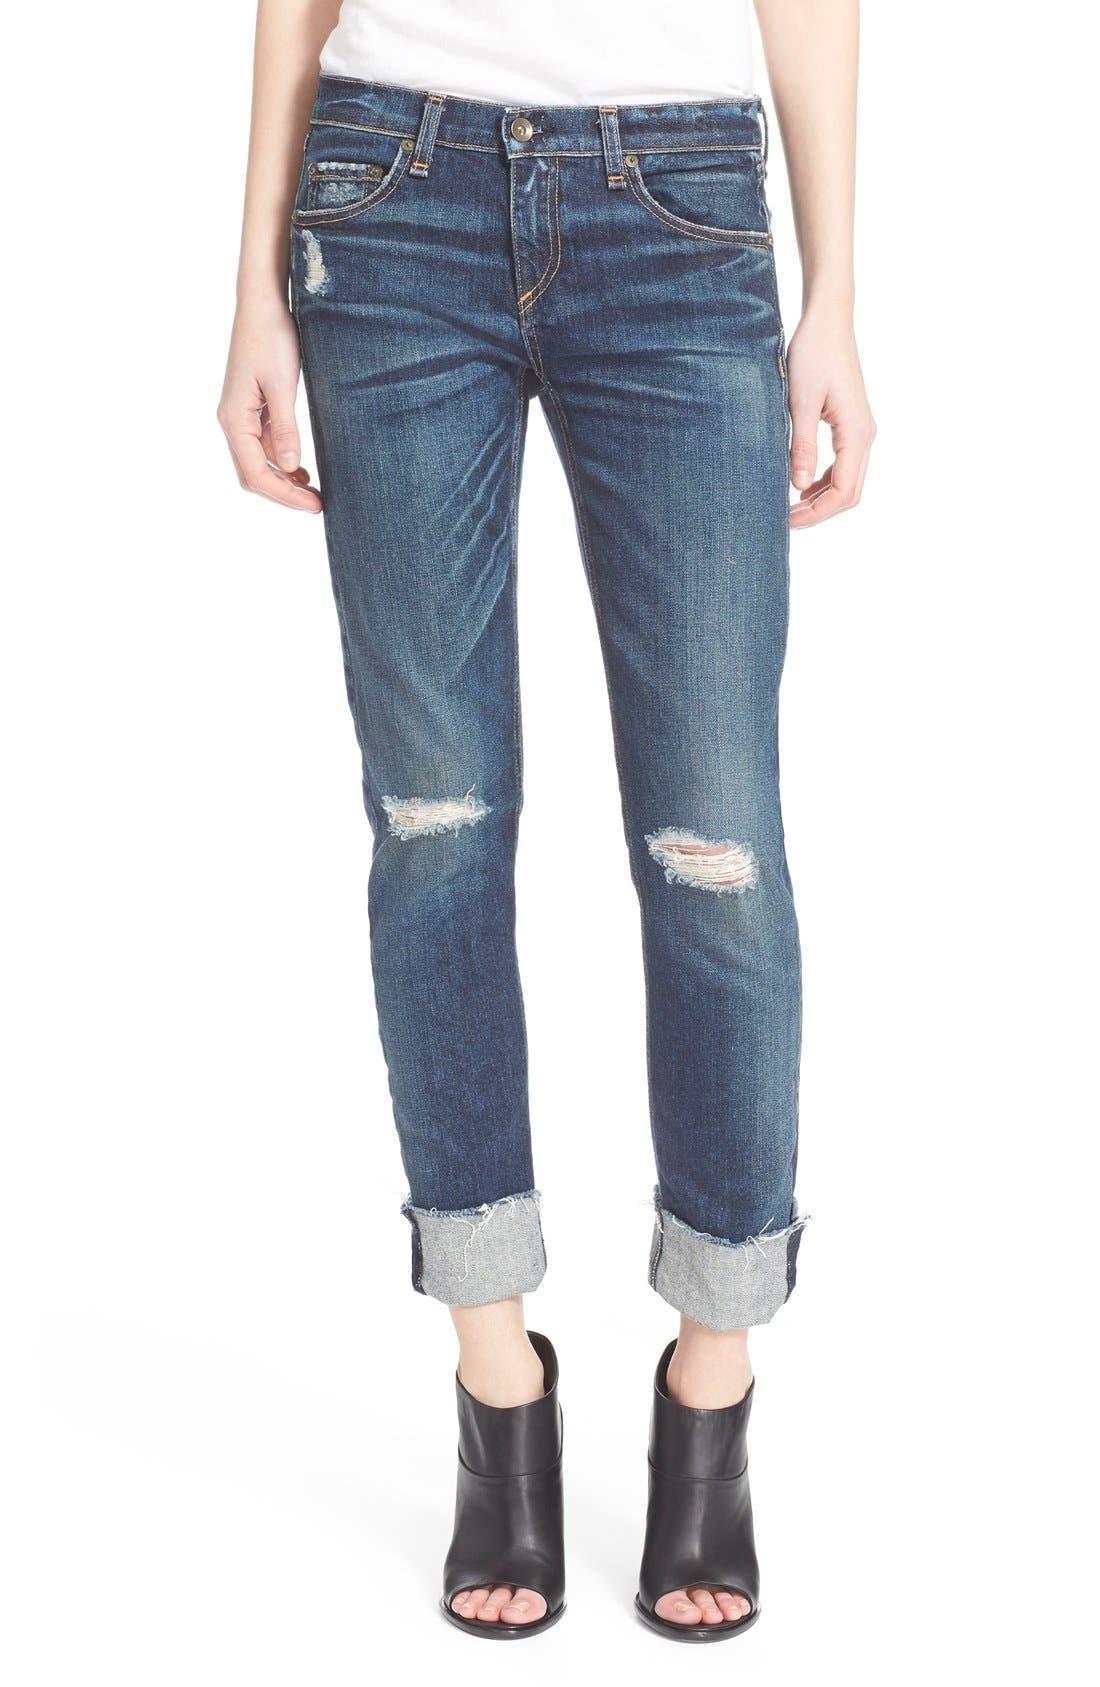 Main Image - rag & bone/JEAN 'The Dre' Slim Fit Boyfriend Jeans (Mabel)